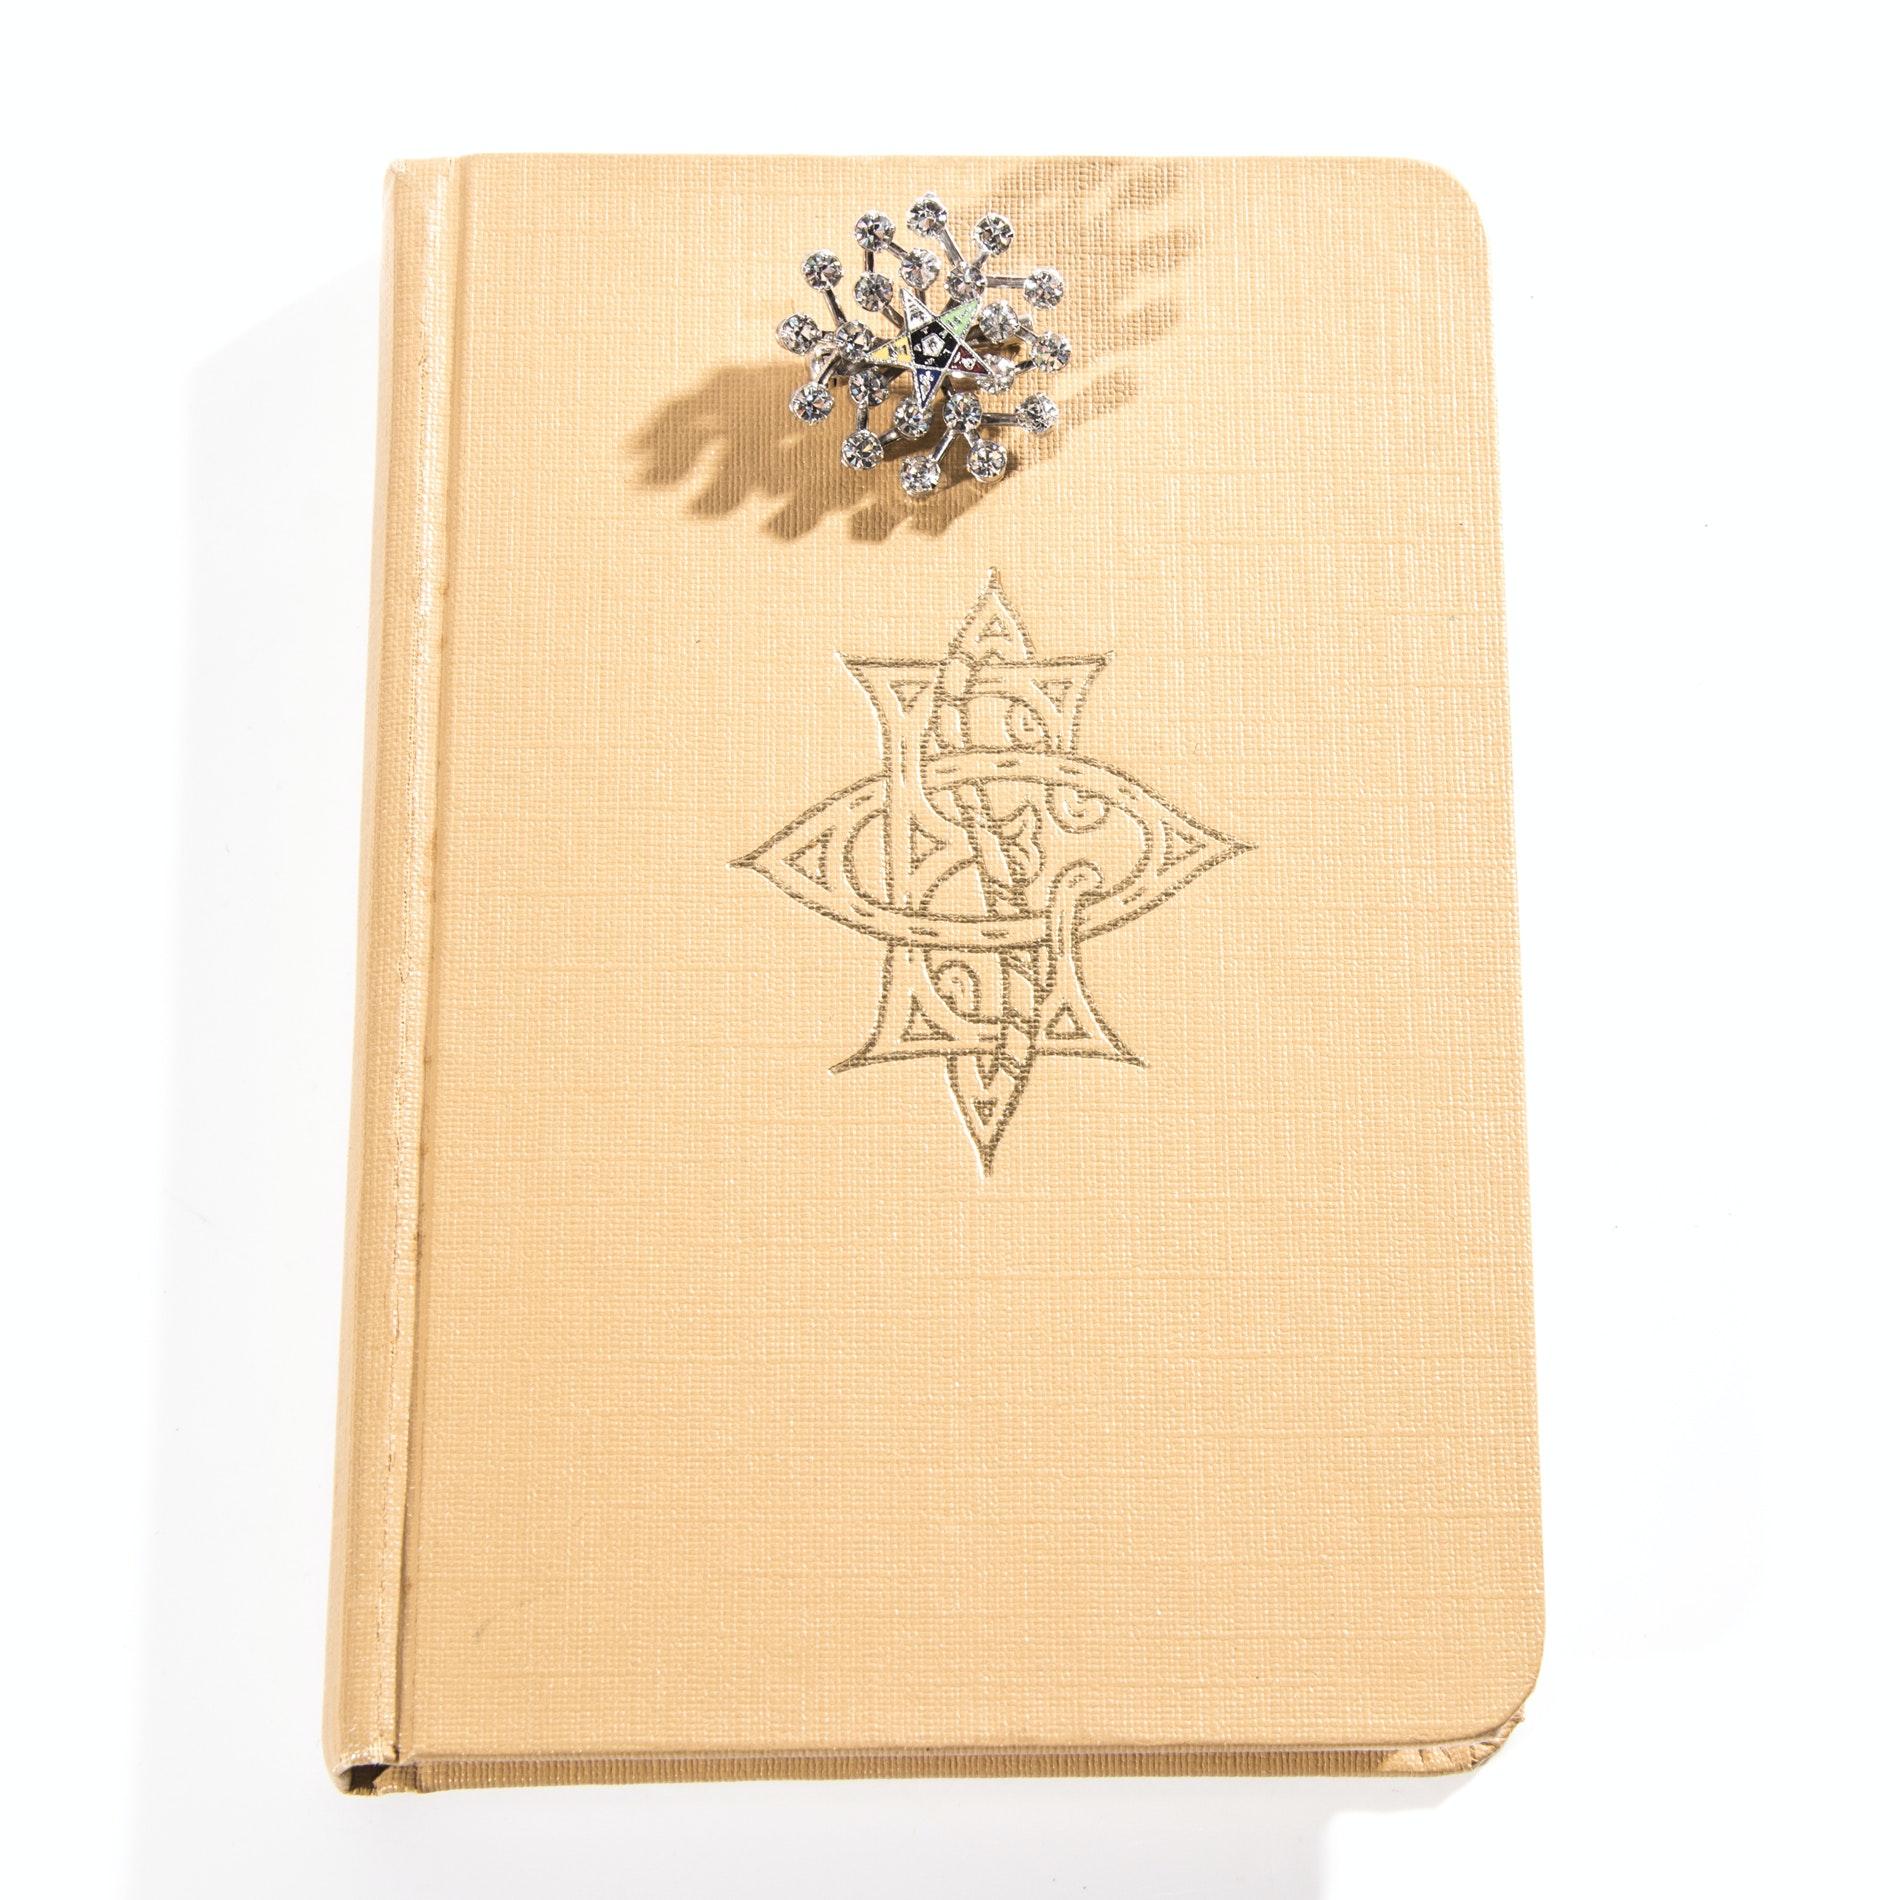 Order of the Eastern Star Handbook and Rhinestone Brooch